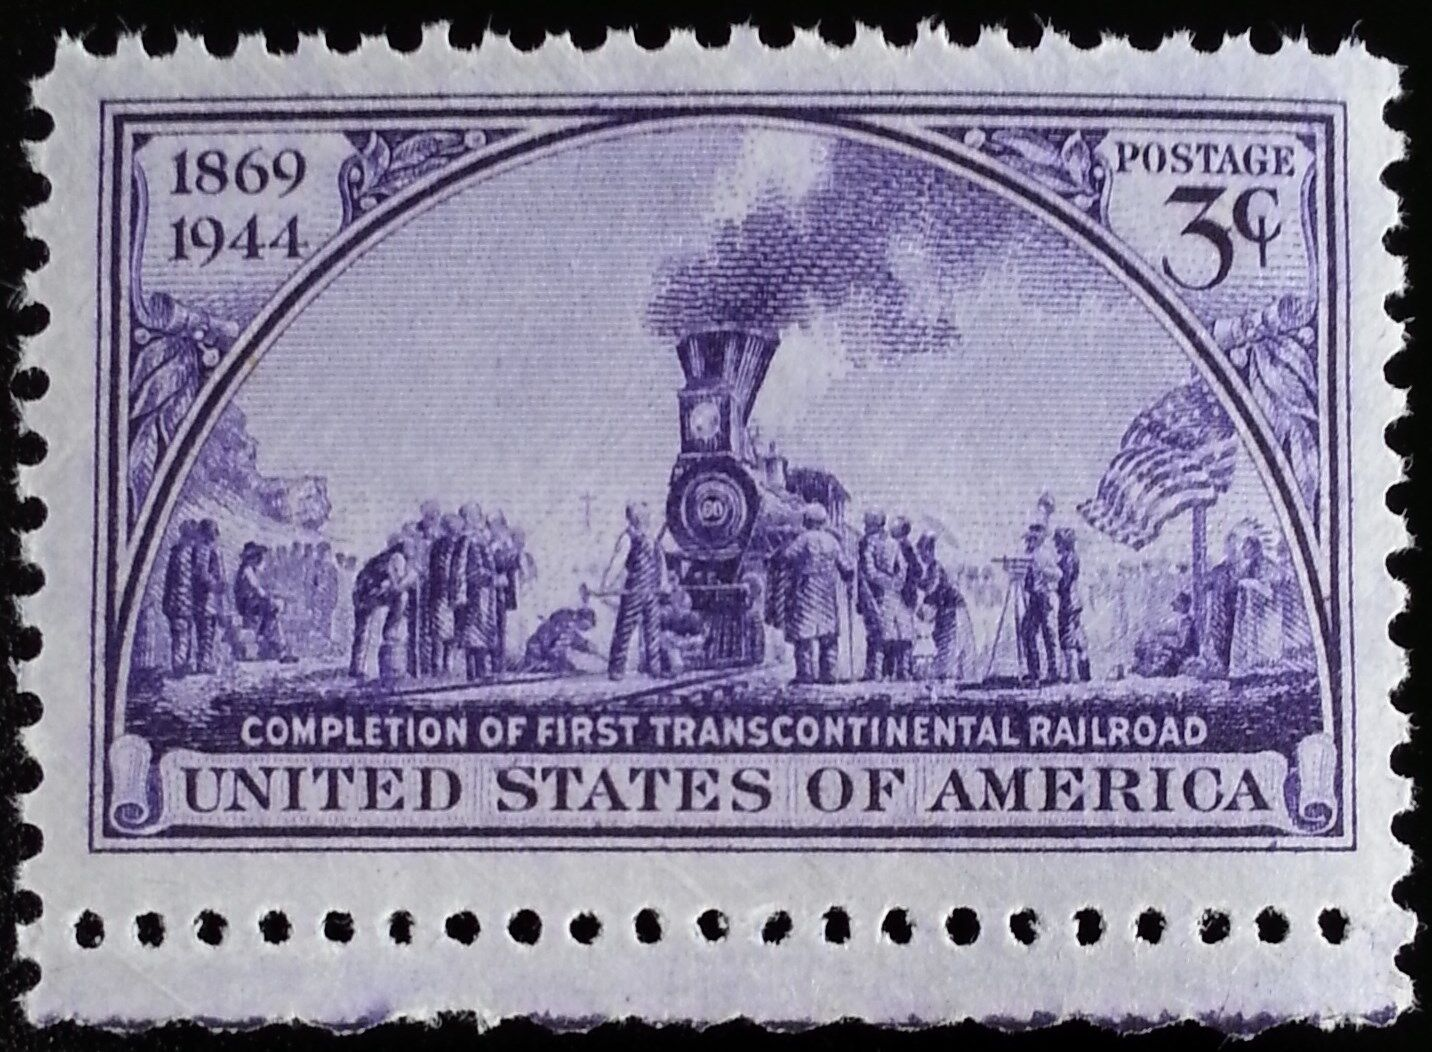 1944 3c First Transcontinental Railroad, 75th Anniversa